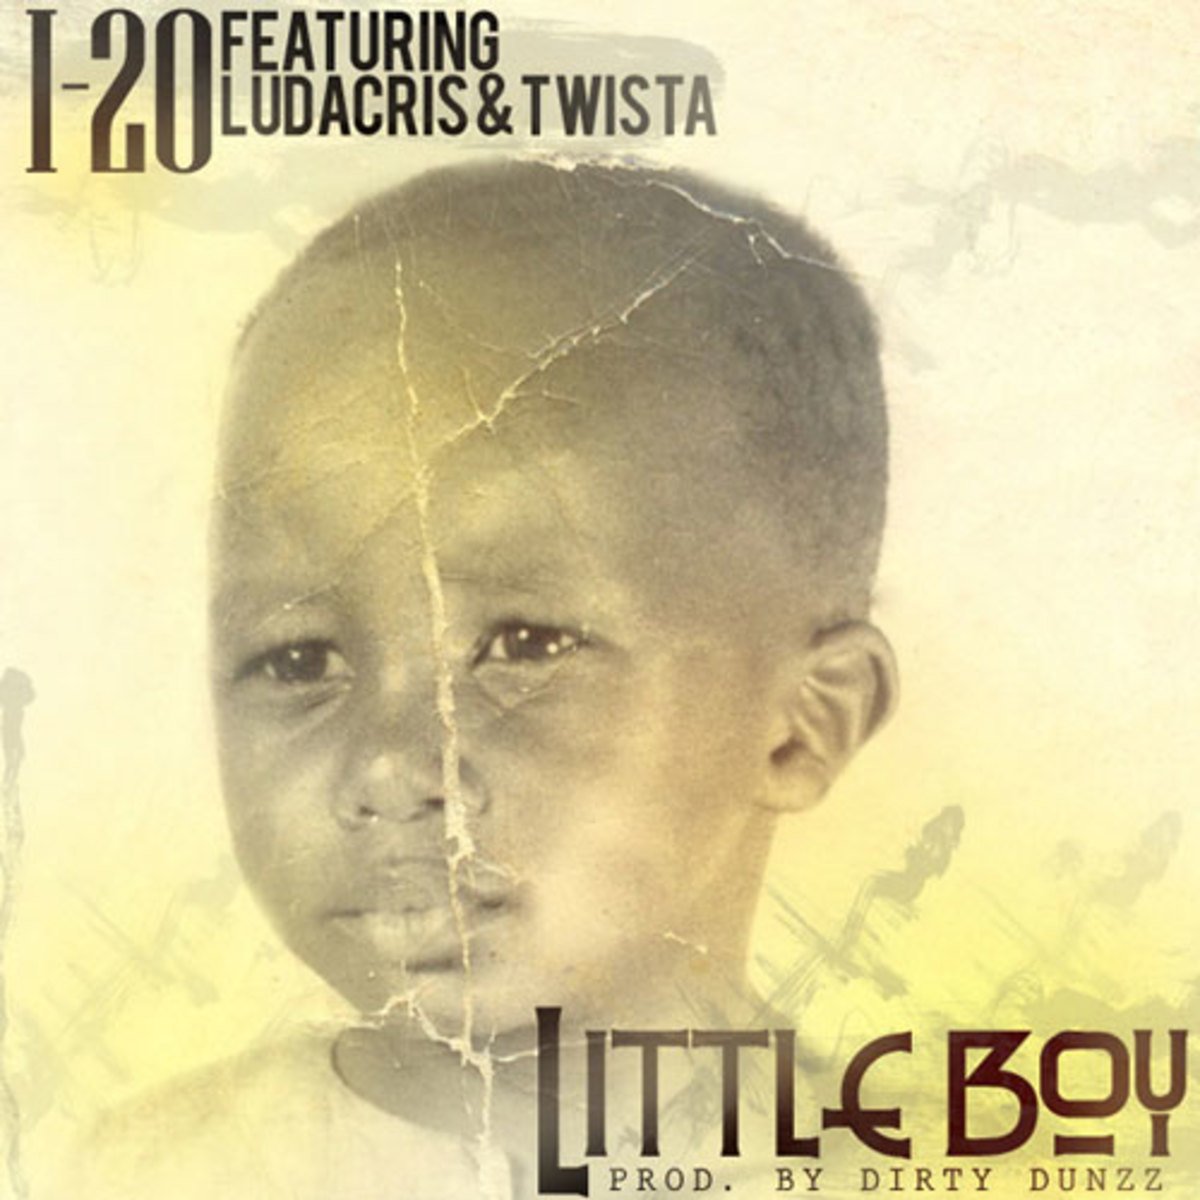 i20-littleboy.jpg